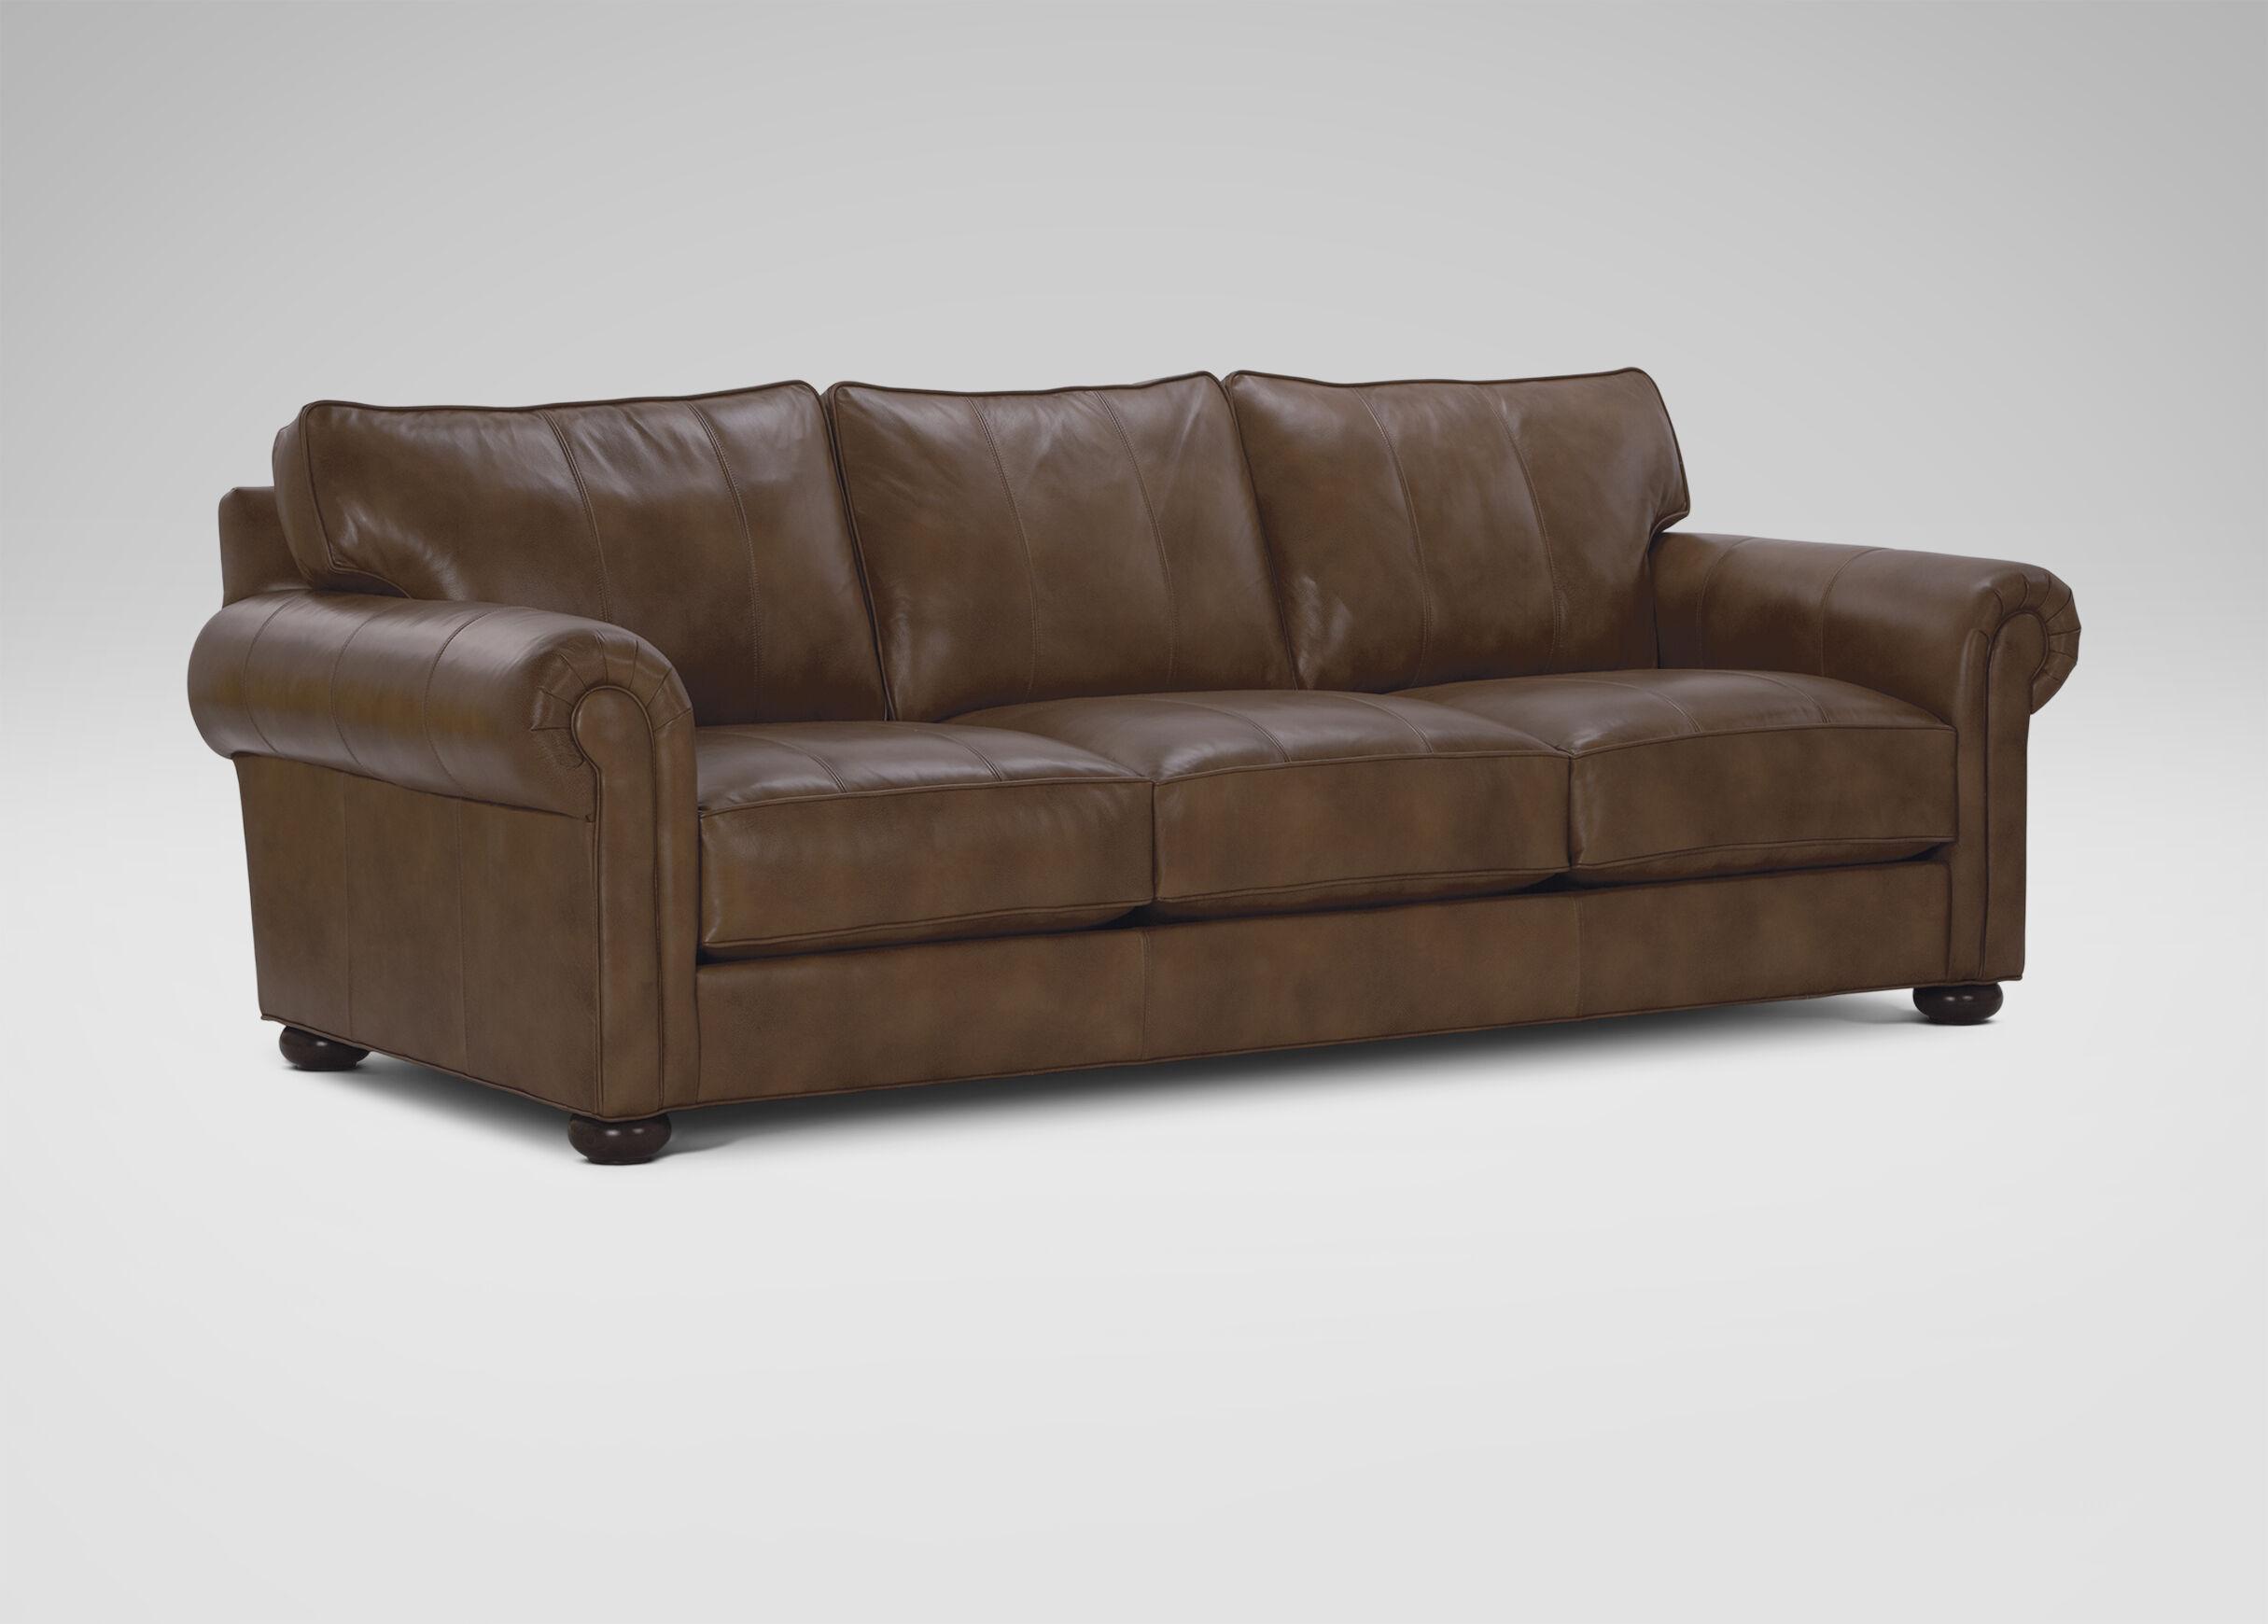 Richmond Leather Sofa Sofas Loveseats SiteGenesis 10112